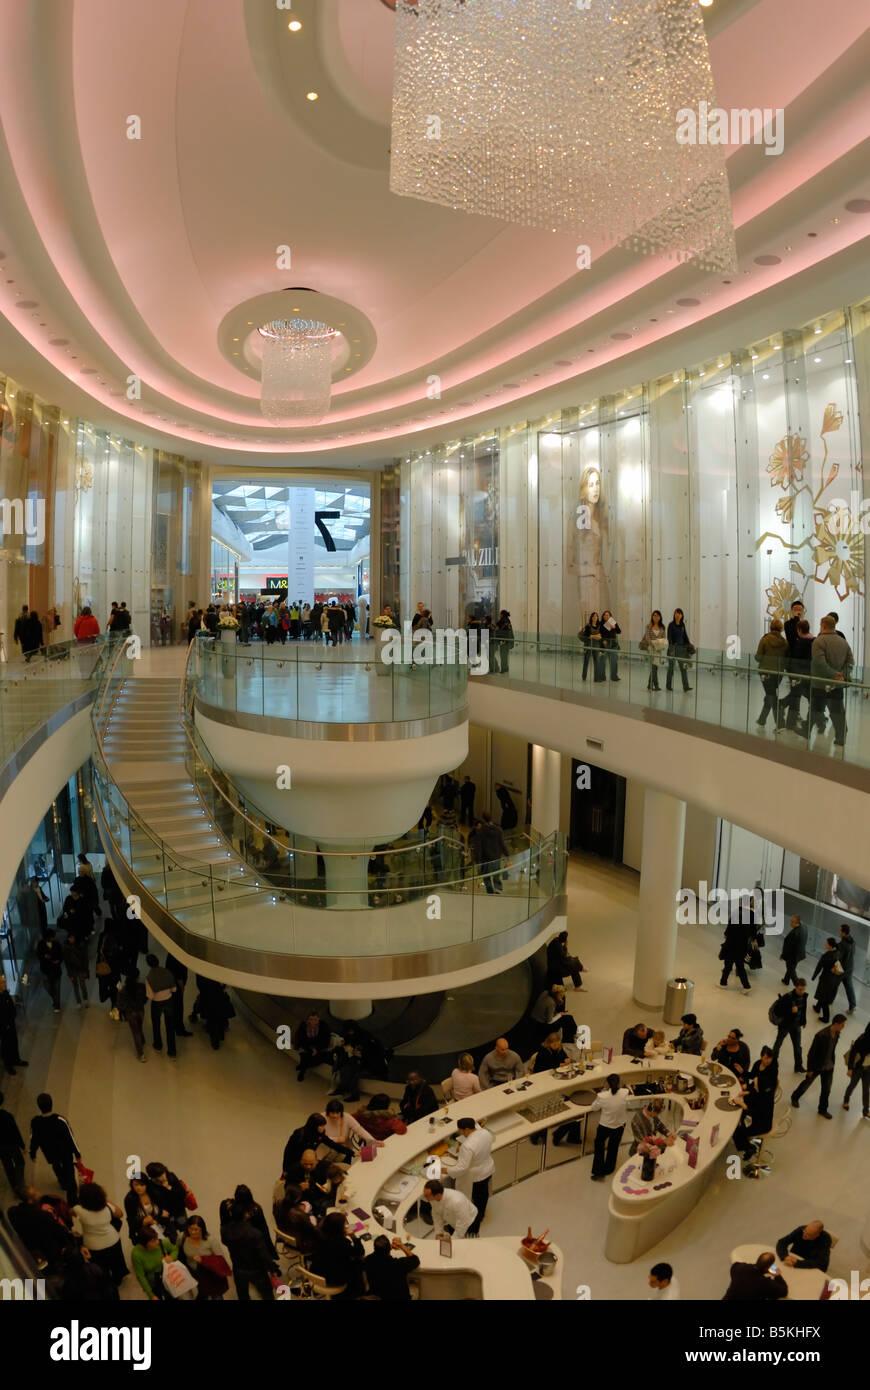 Westfield Shopping Centre Shepherd's Bush London - Stock Image